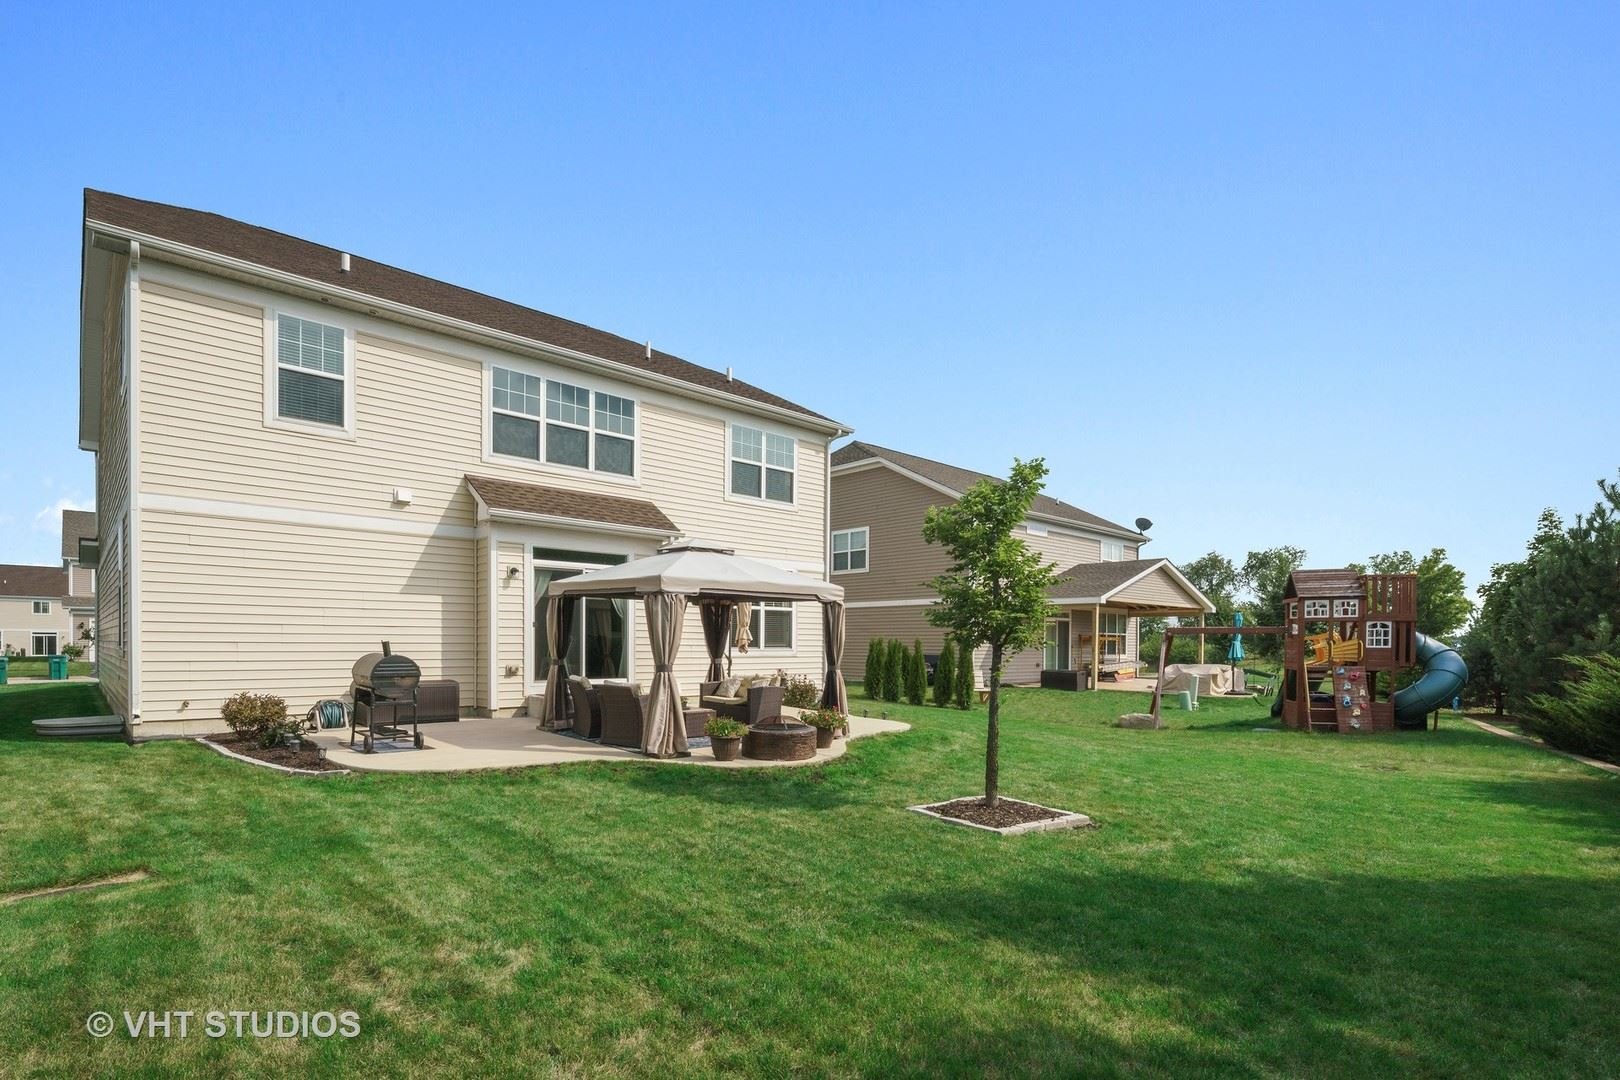 Photo of 14920 Morgan Lane, Plainfield, IL 60544 (MLS # 10862307)